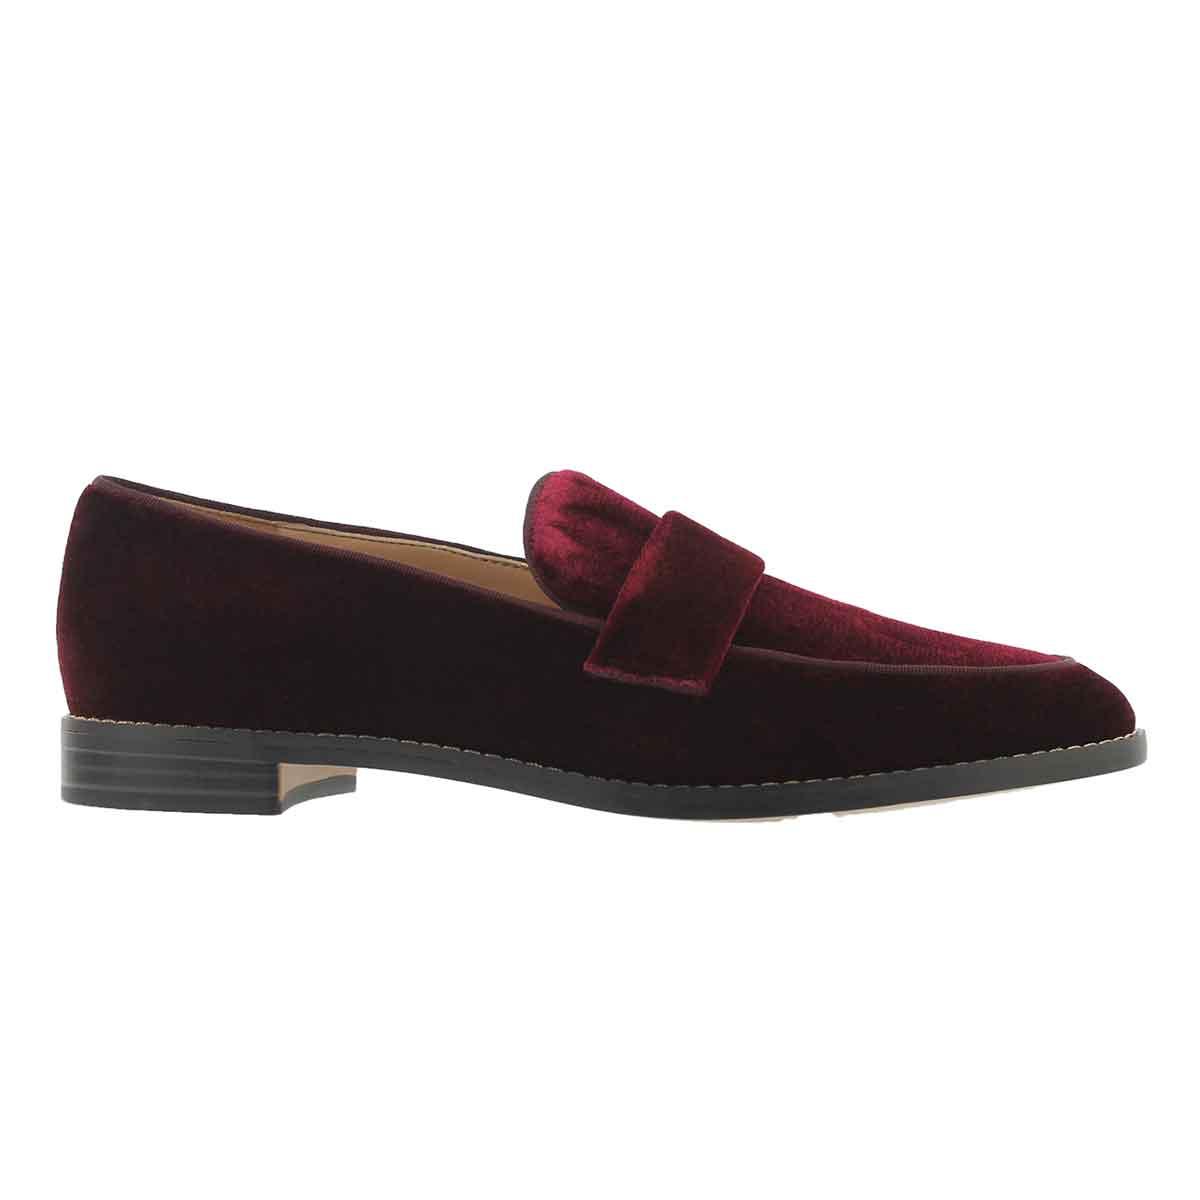 Lds Hudley burgundy casual slip on shoe